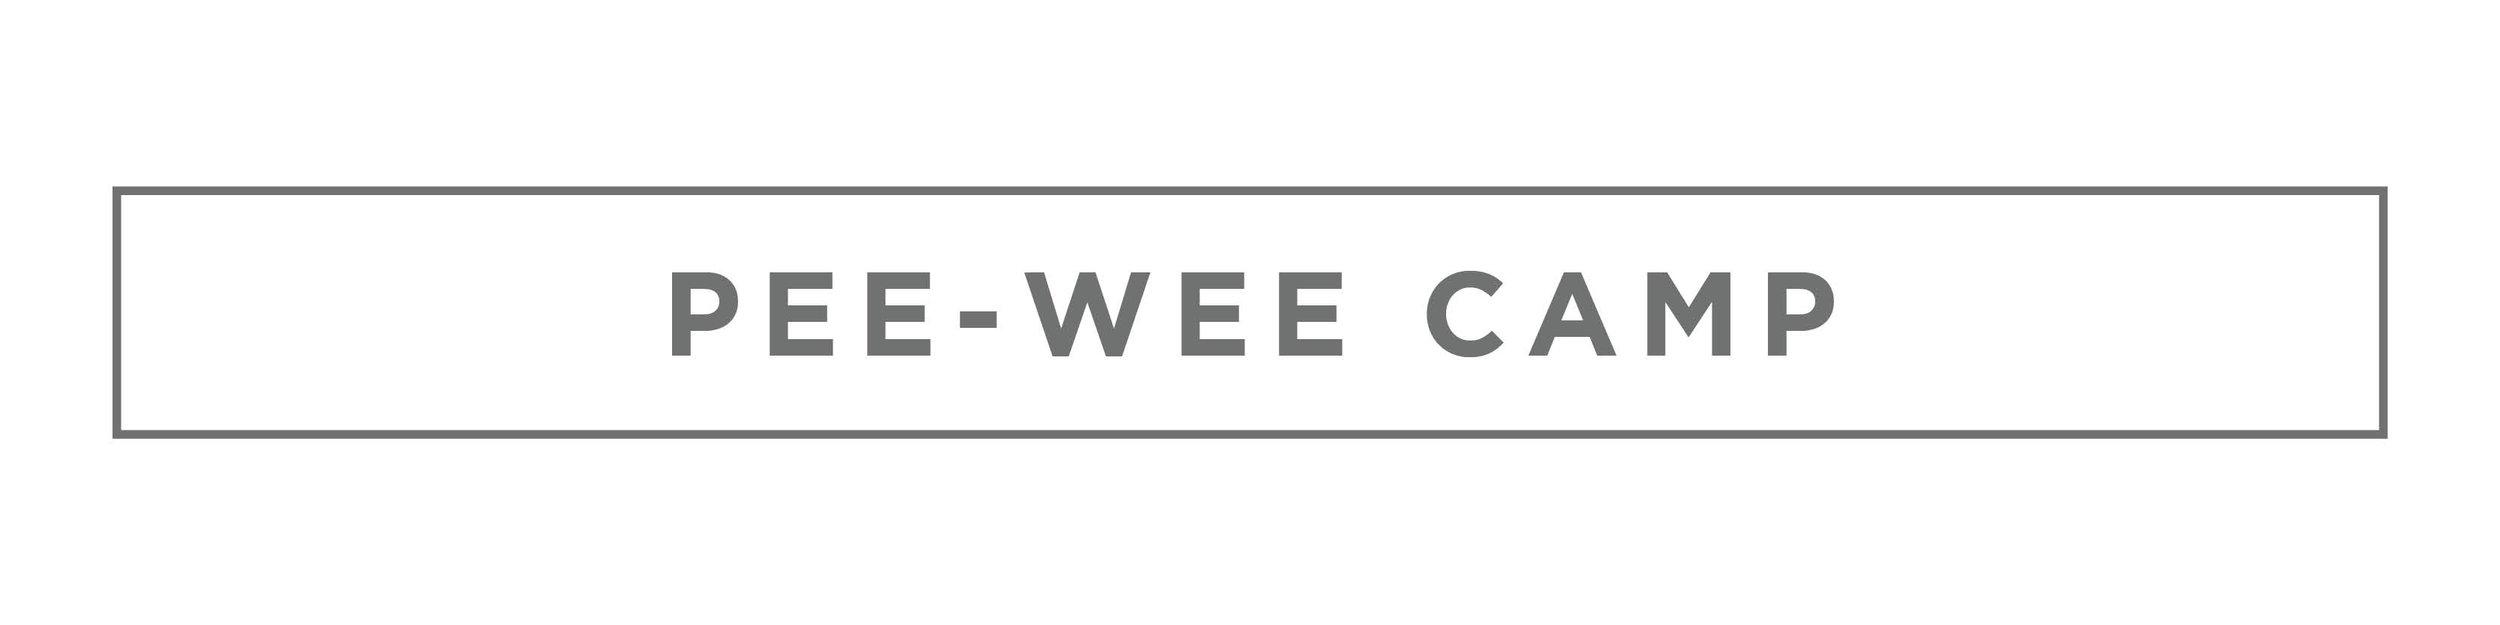 pee-wee camp button.jpg